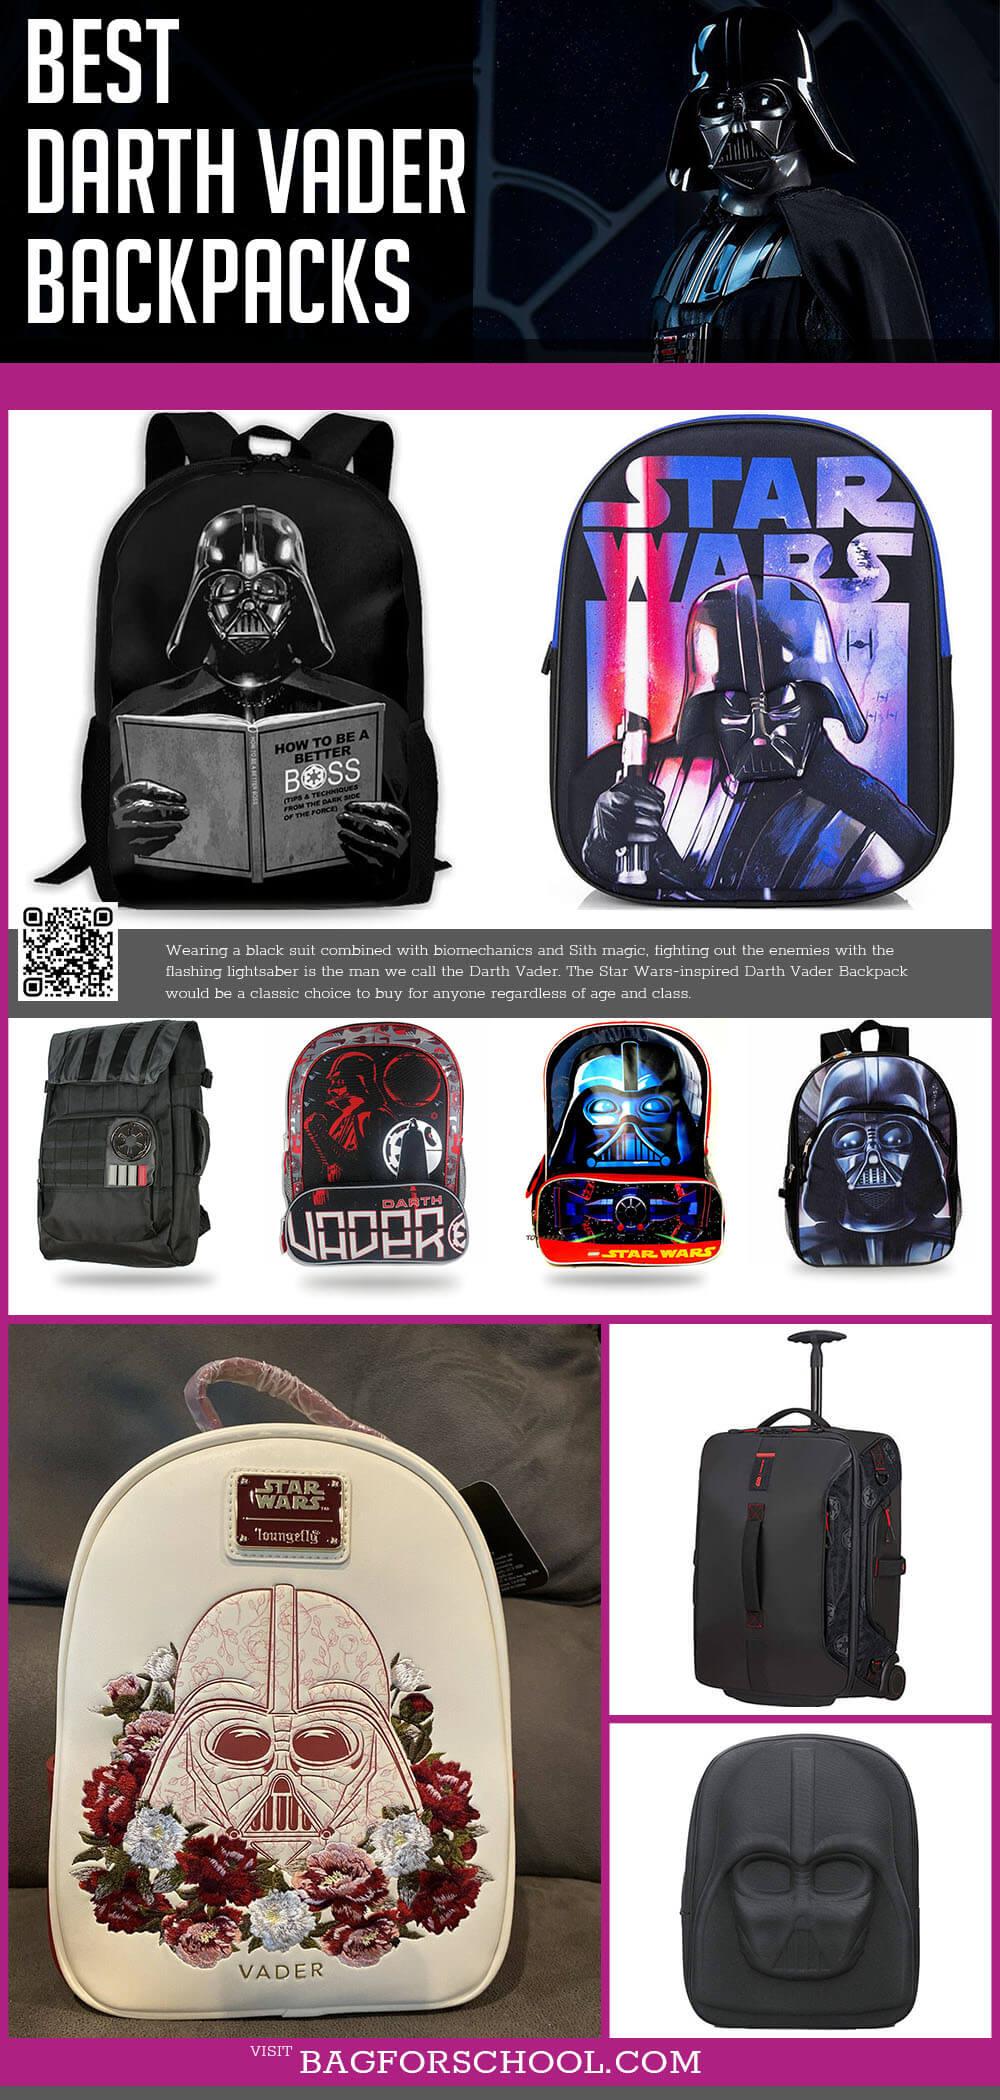 Star Wars Darth Vader Backpacks